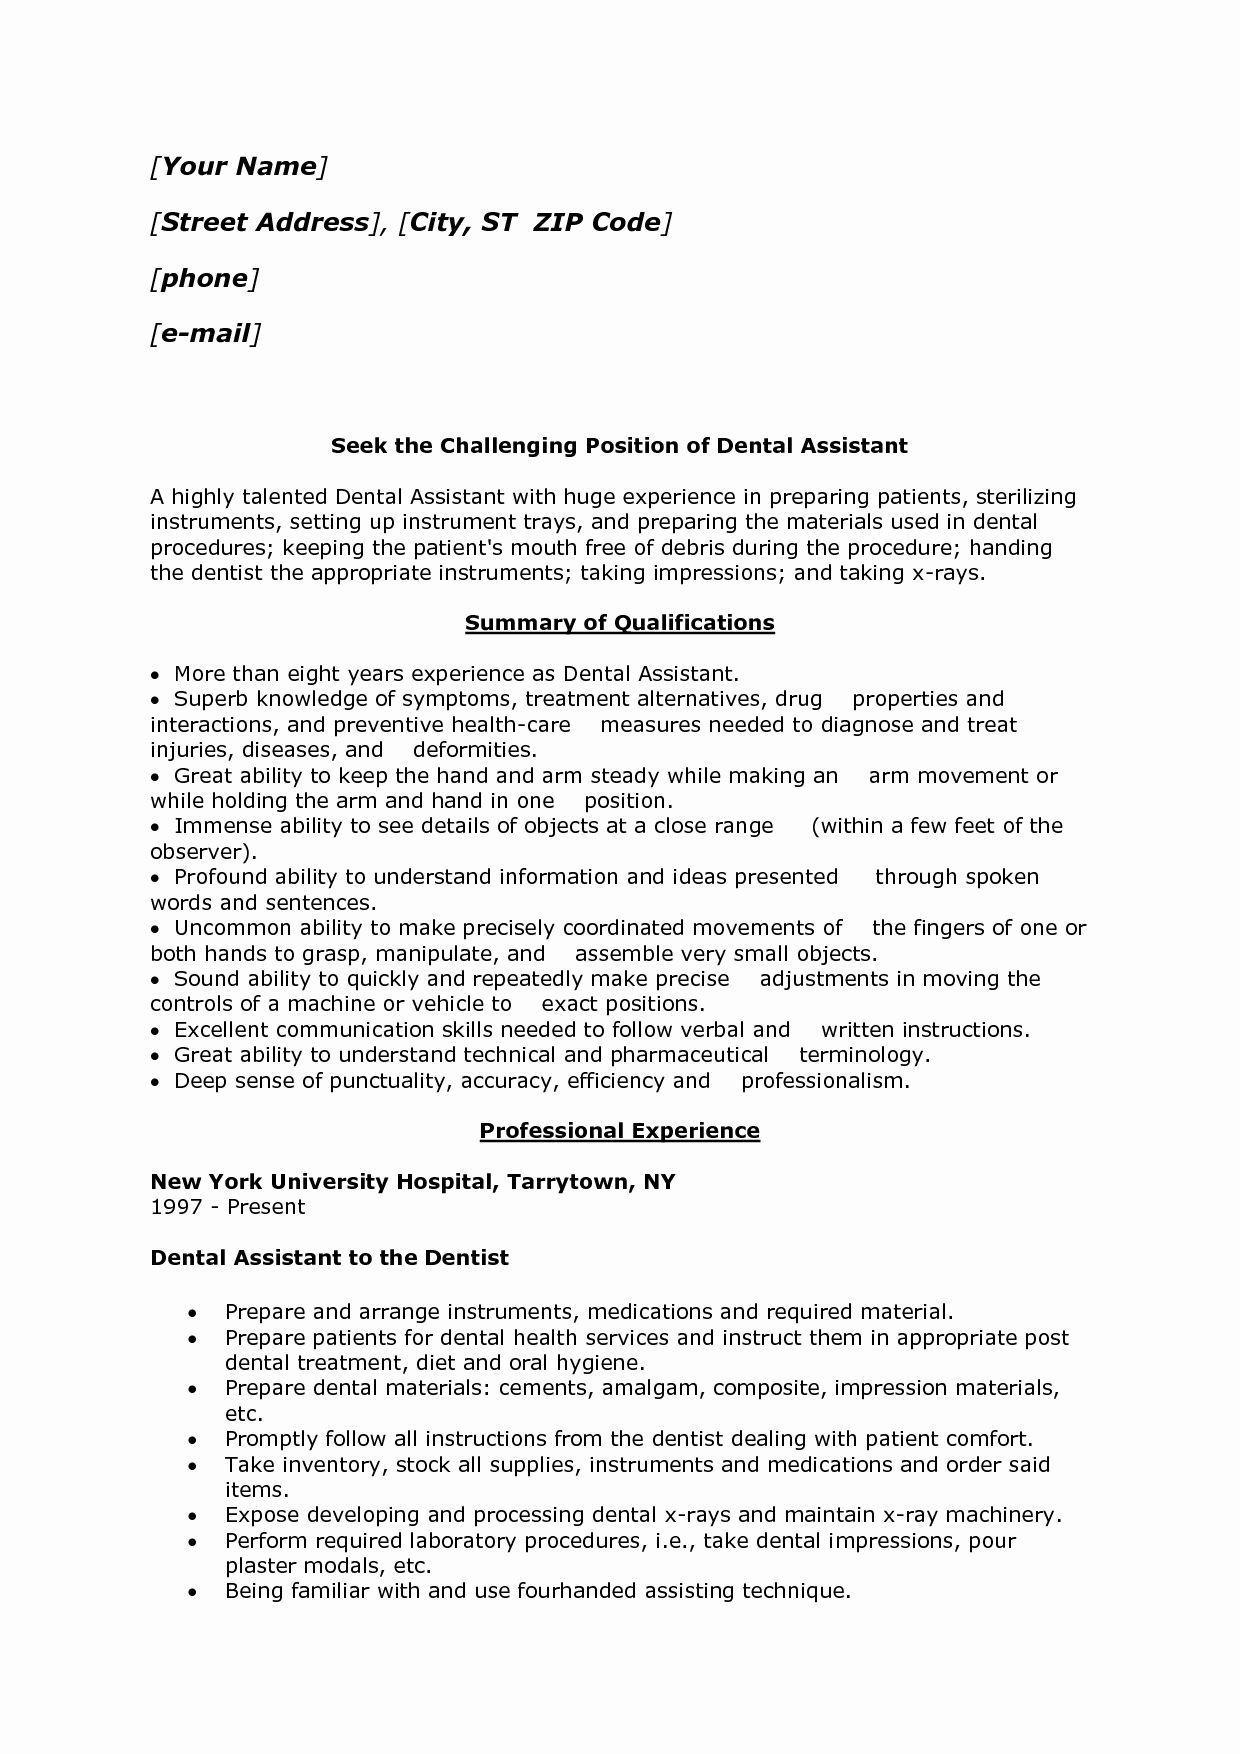 Resume tense example ecuador essay